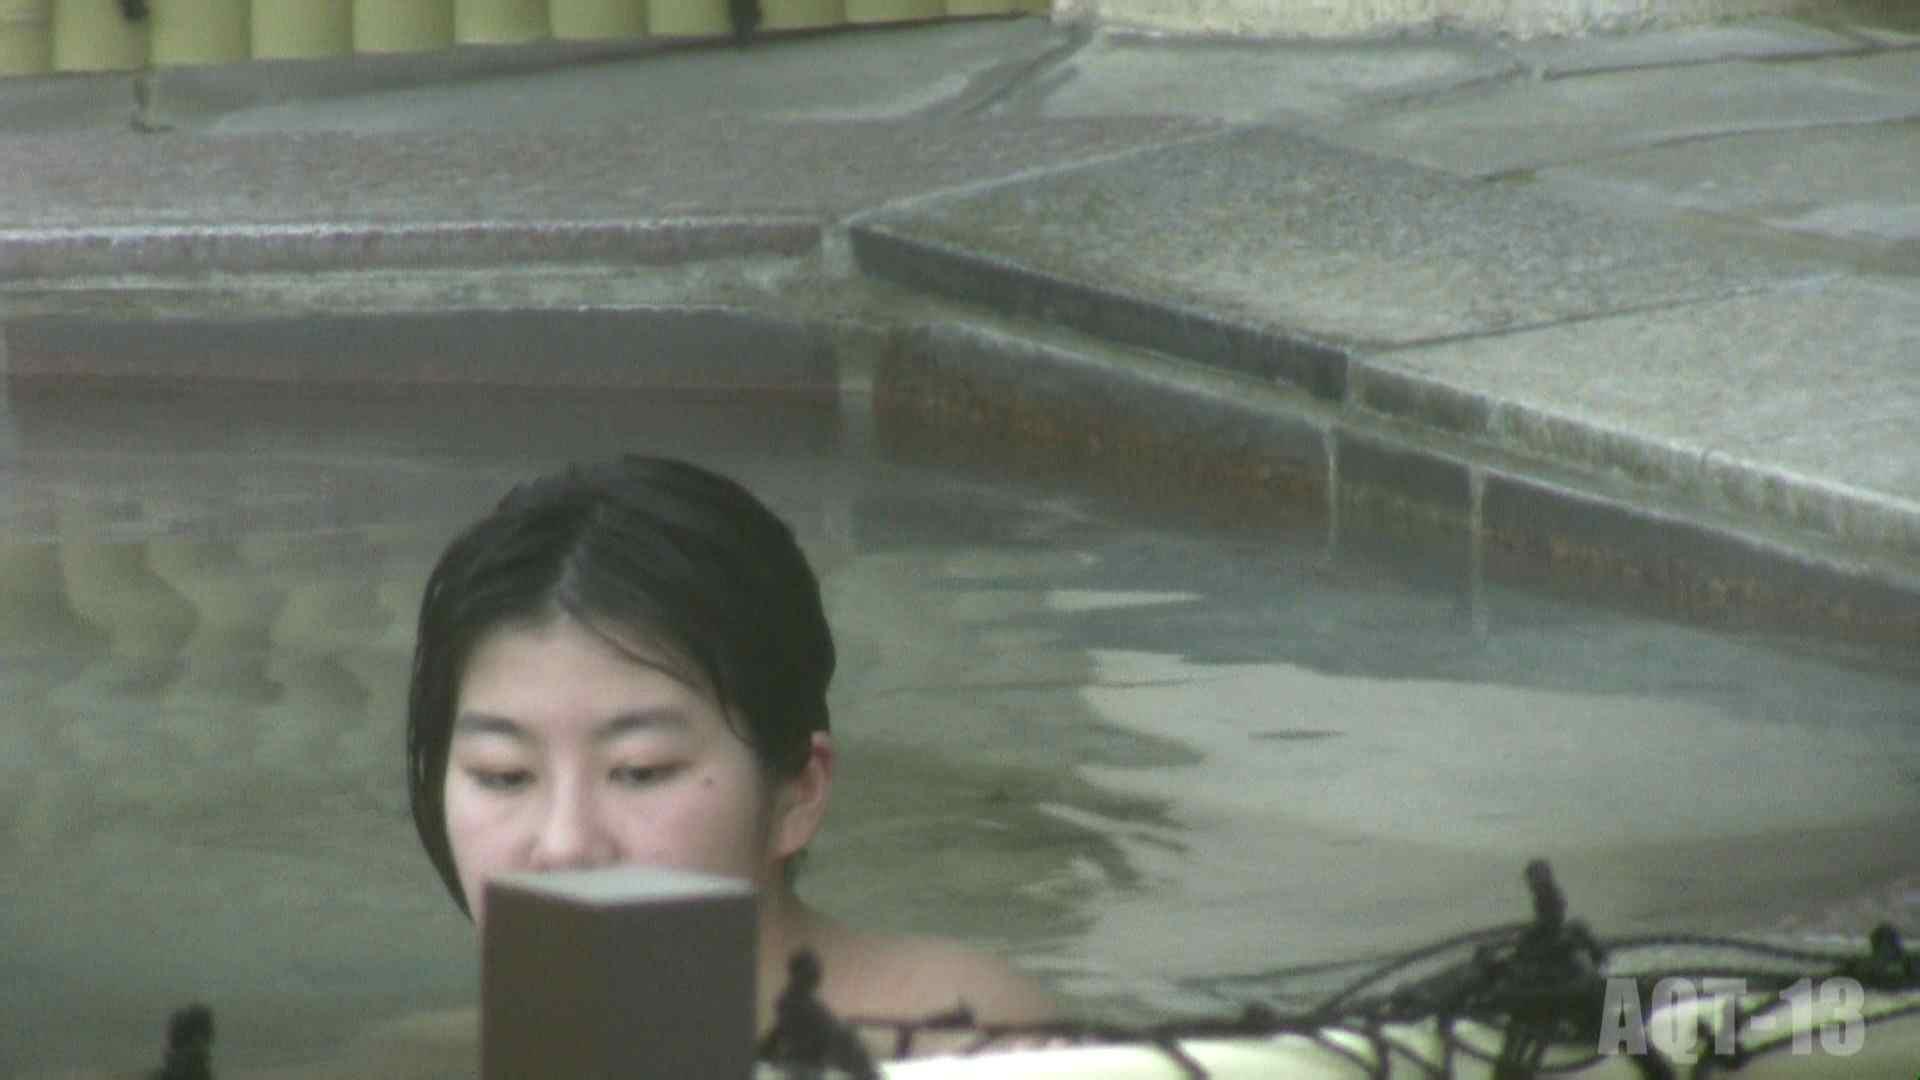 Aquaな露天風呂Vol.816 OLのエロ生活 | 露天風呂  90連発 46